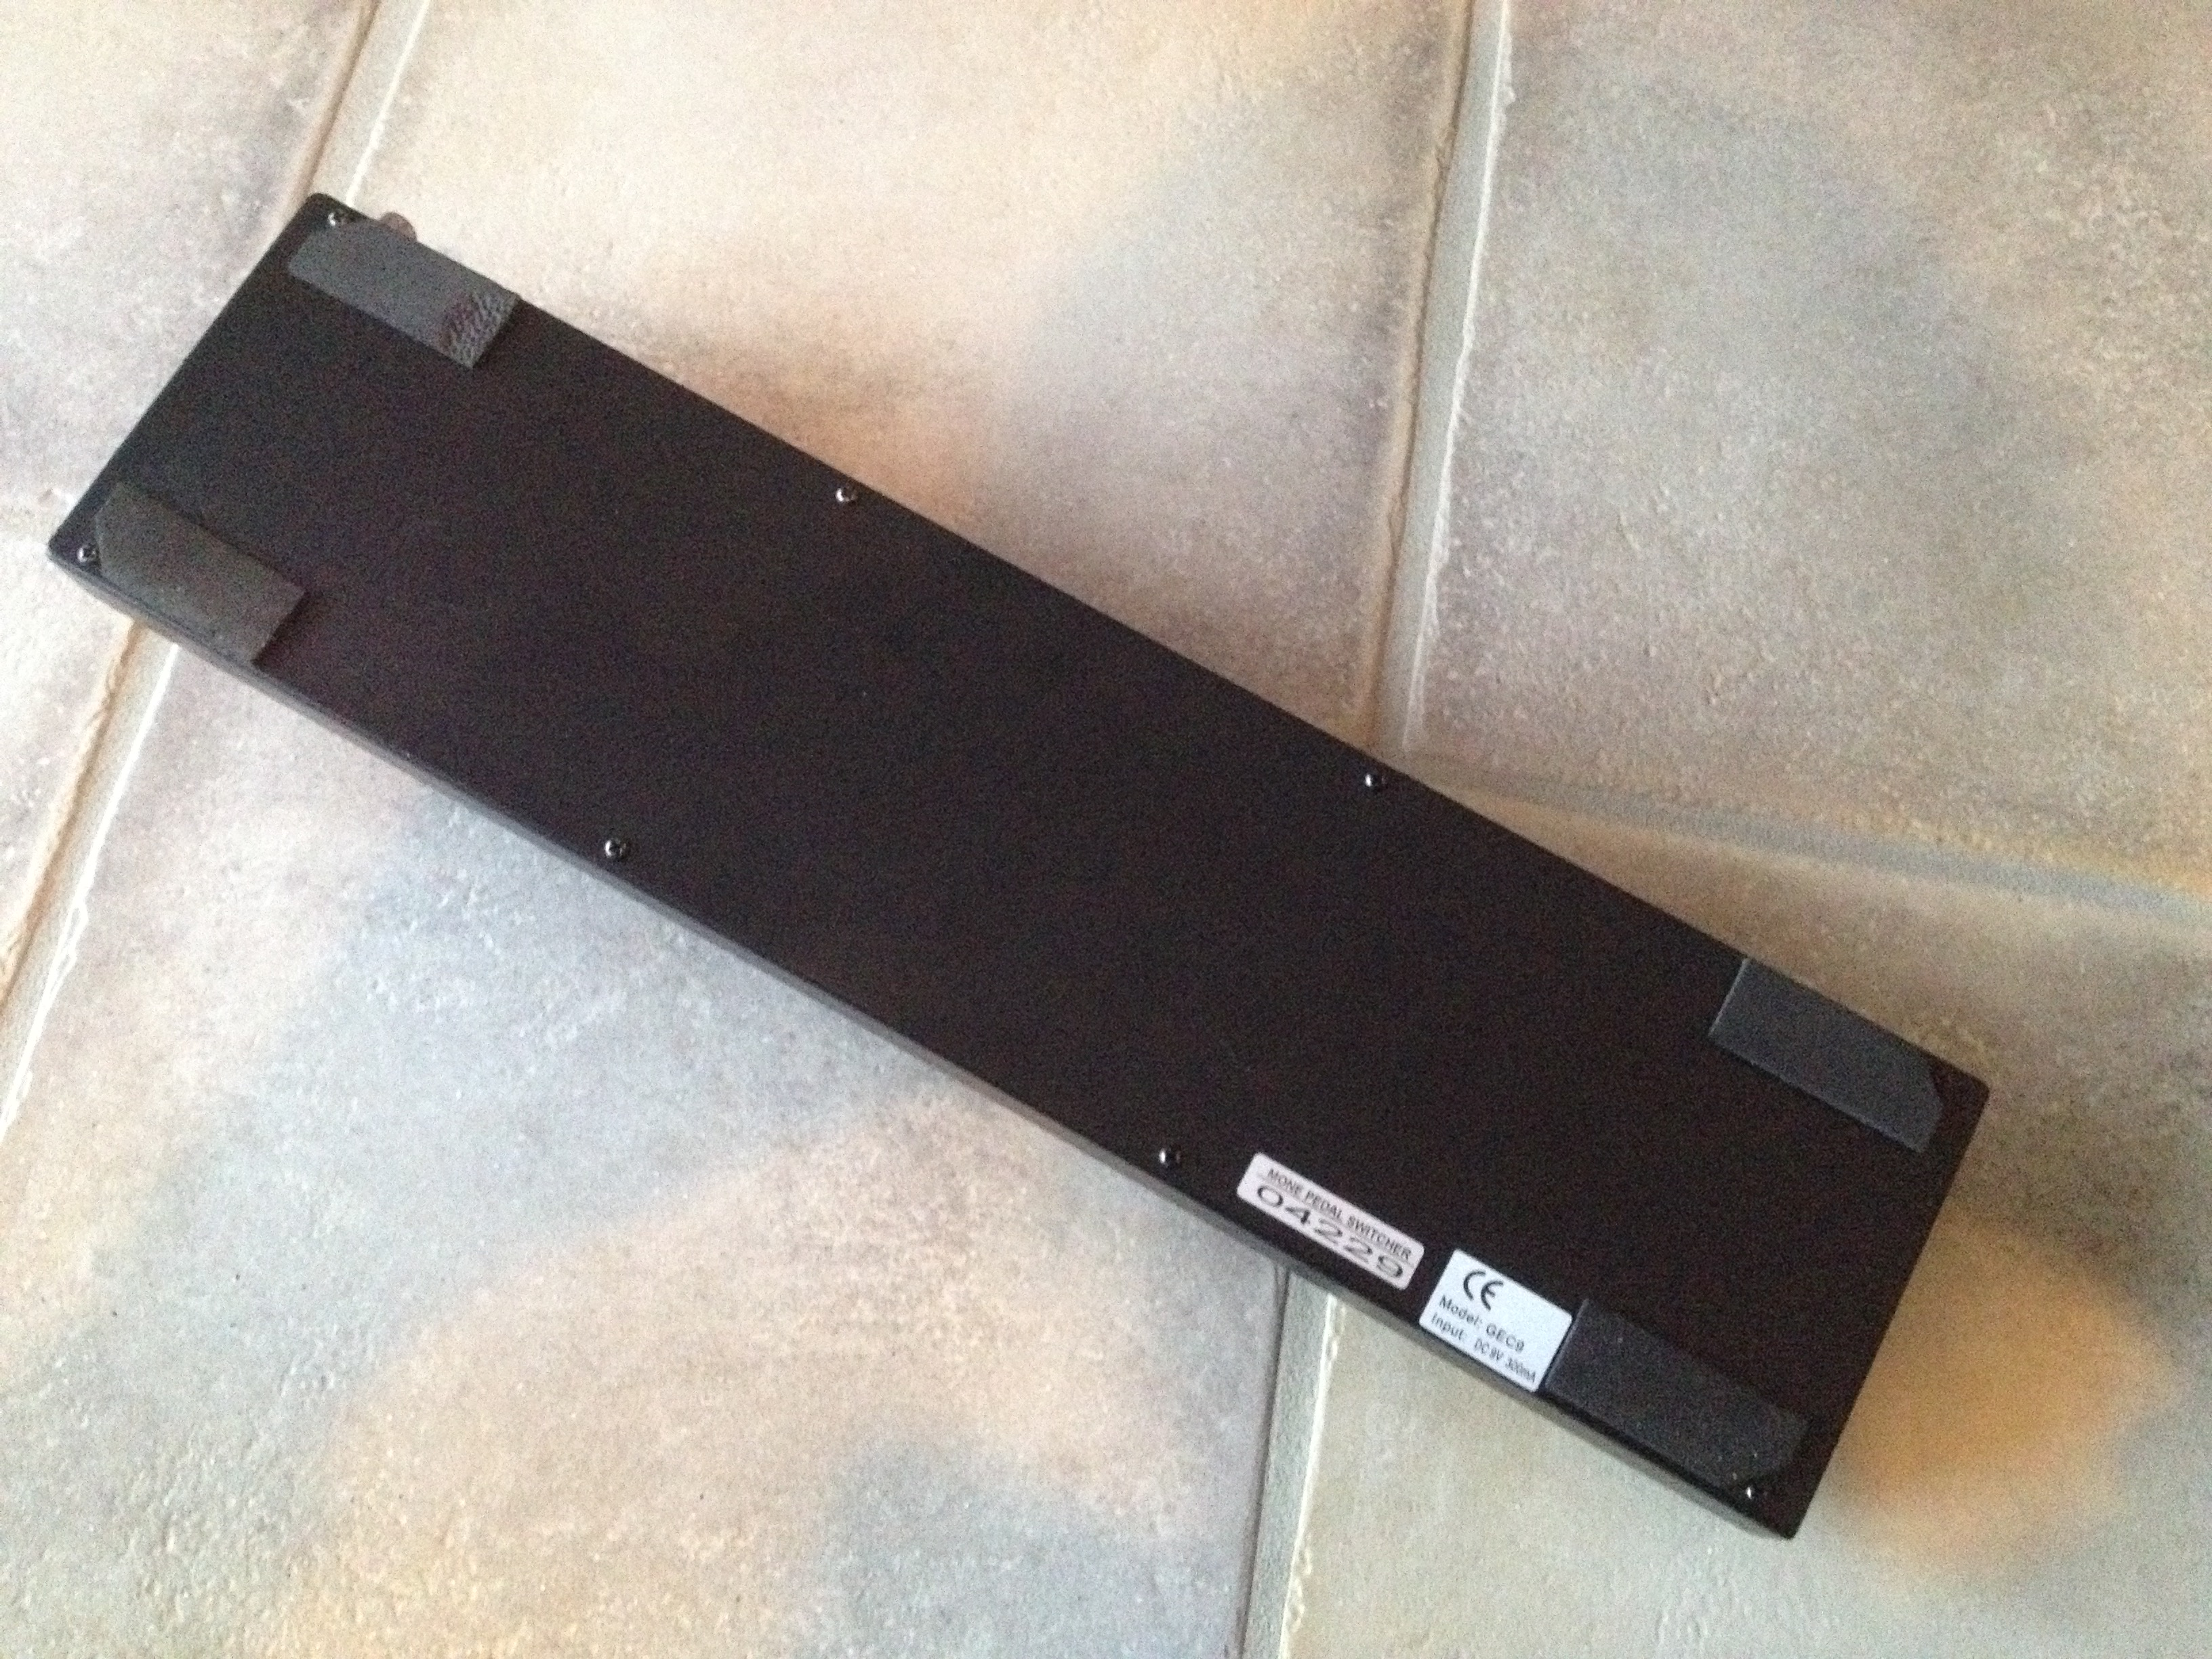 moen gec9 guitar effect controller image 1650896 audiofanzine. Black Bedroom Furniture Sets. Home Design Ideas